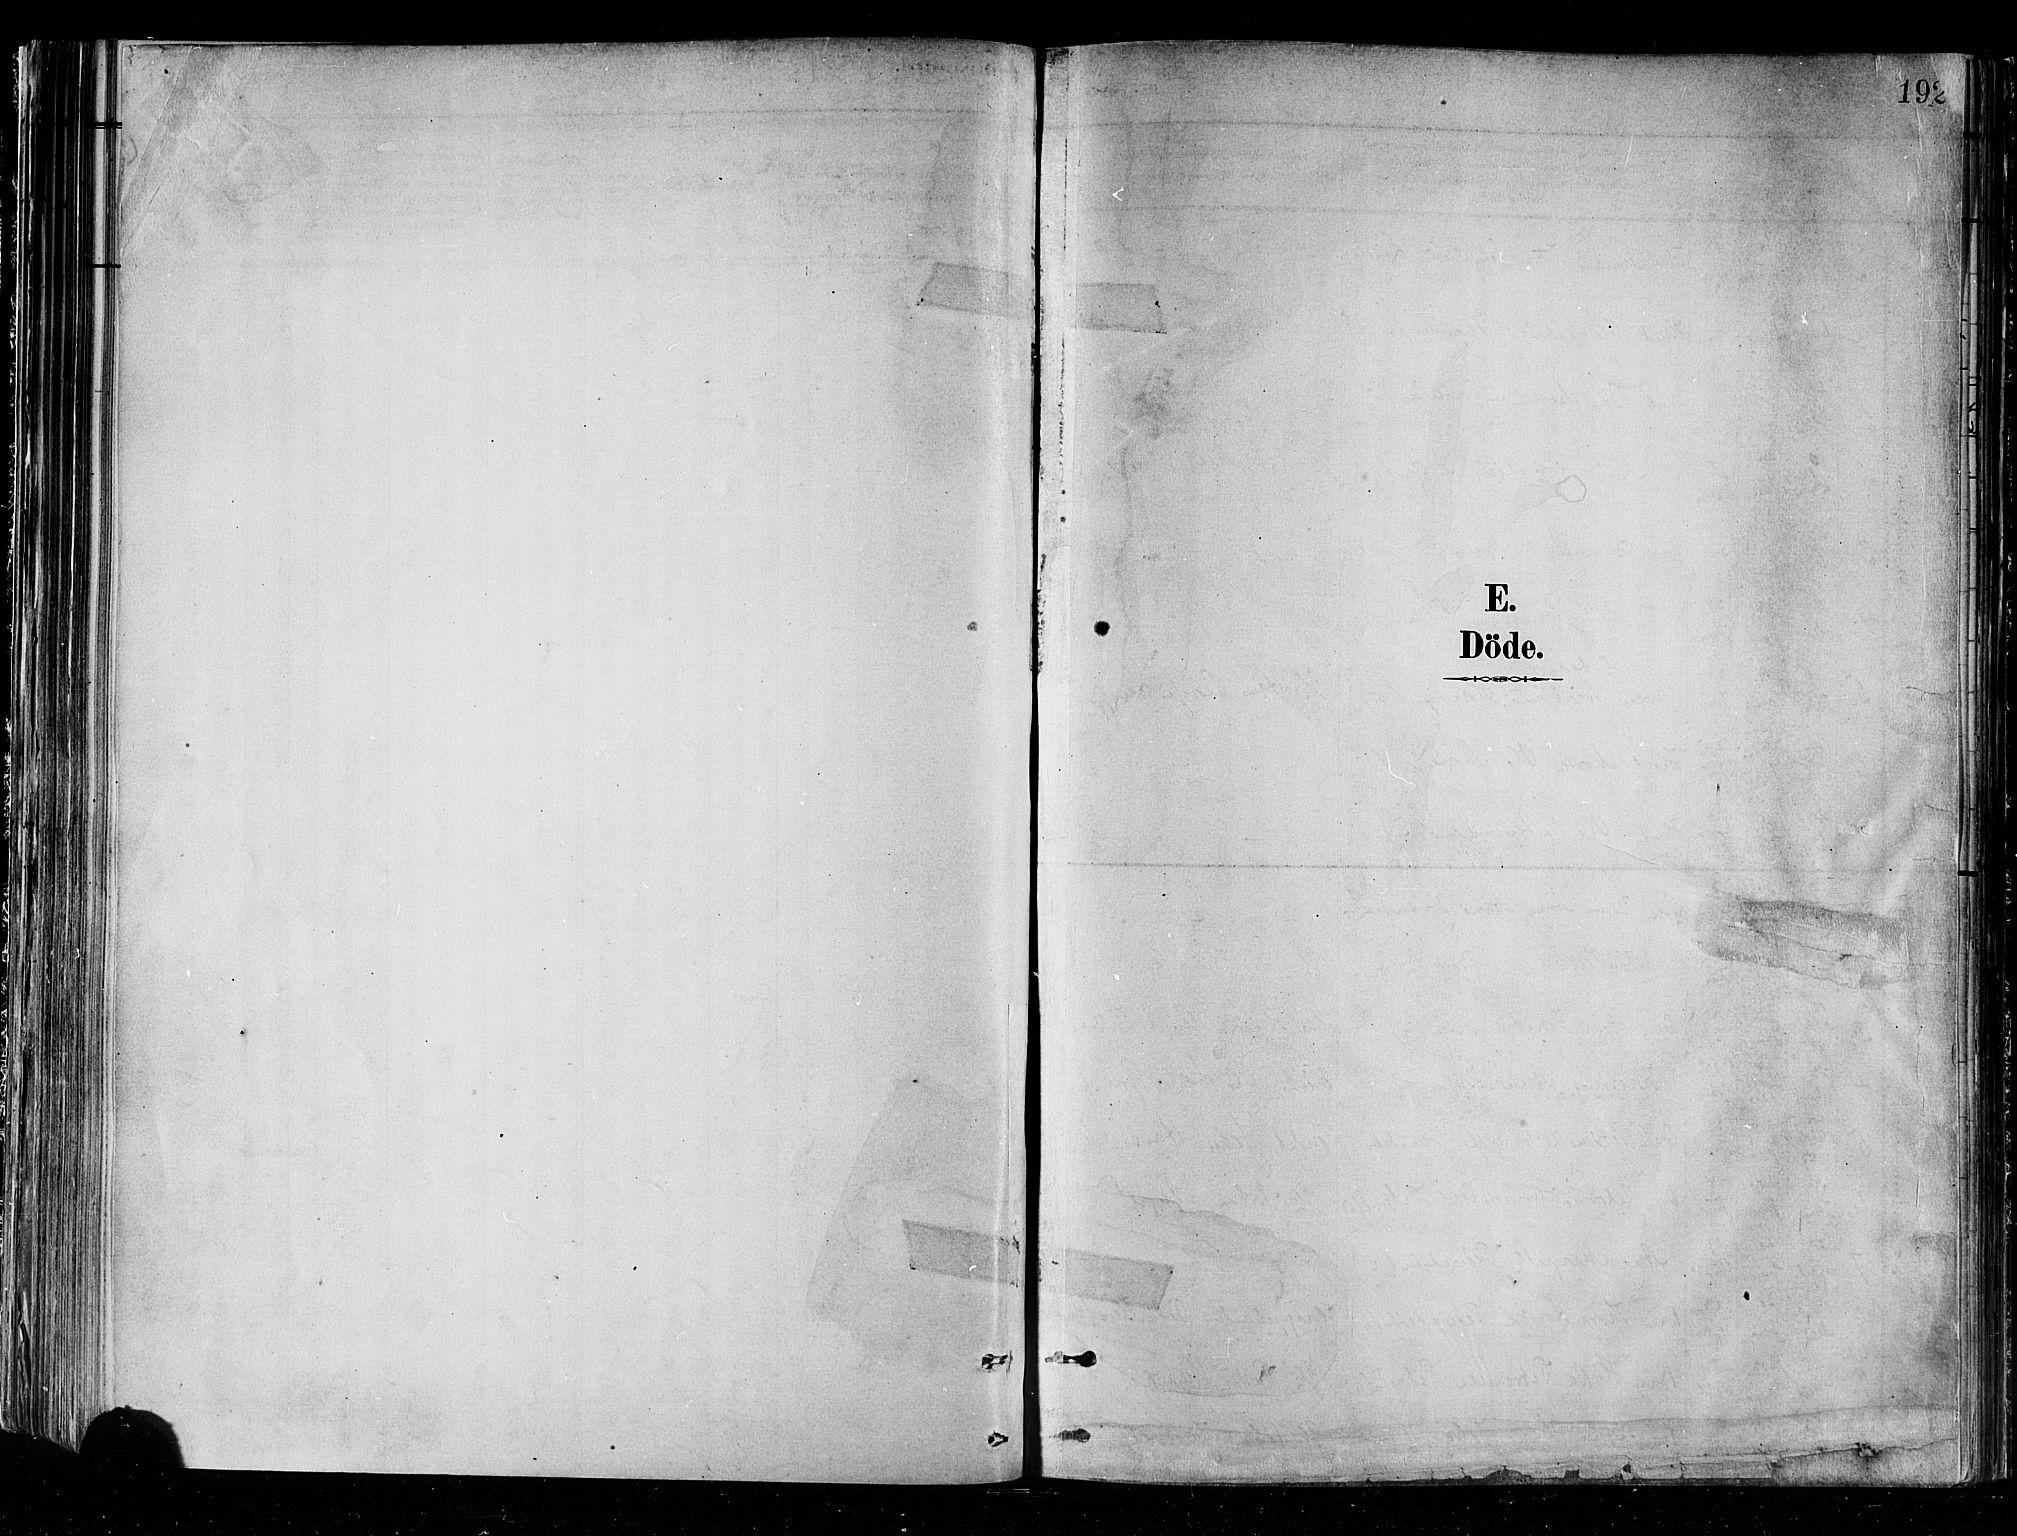 SATØ, Skjervøy sokneprestkontor, H/Ha/Haa/L0010kirke: Ministerialbok nr. 10, 1887-1898, s. 192